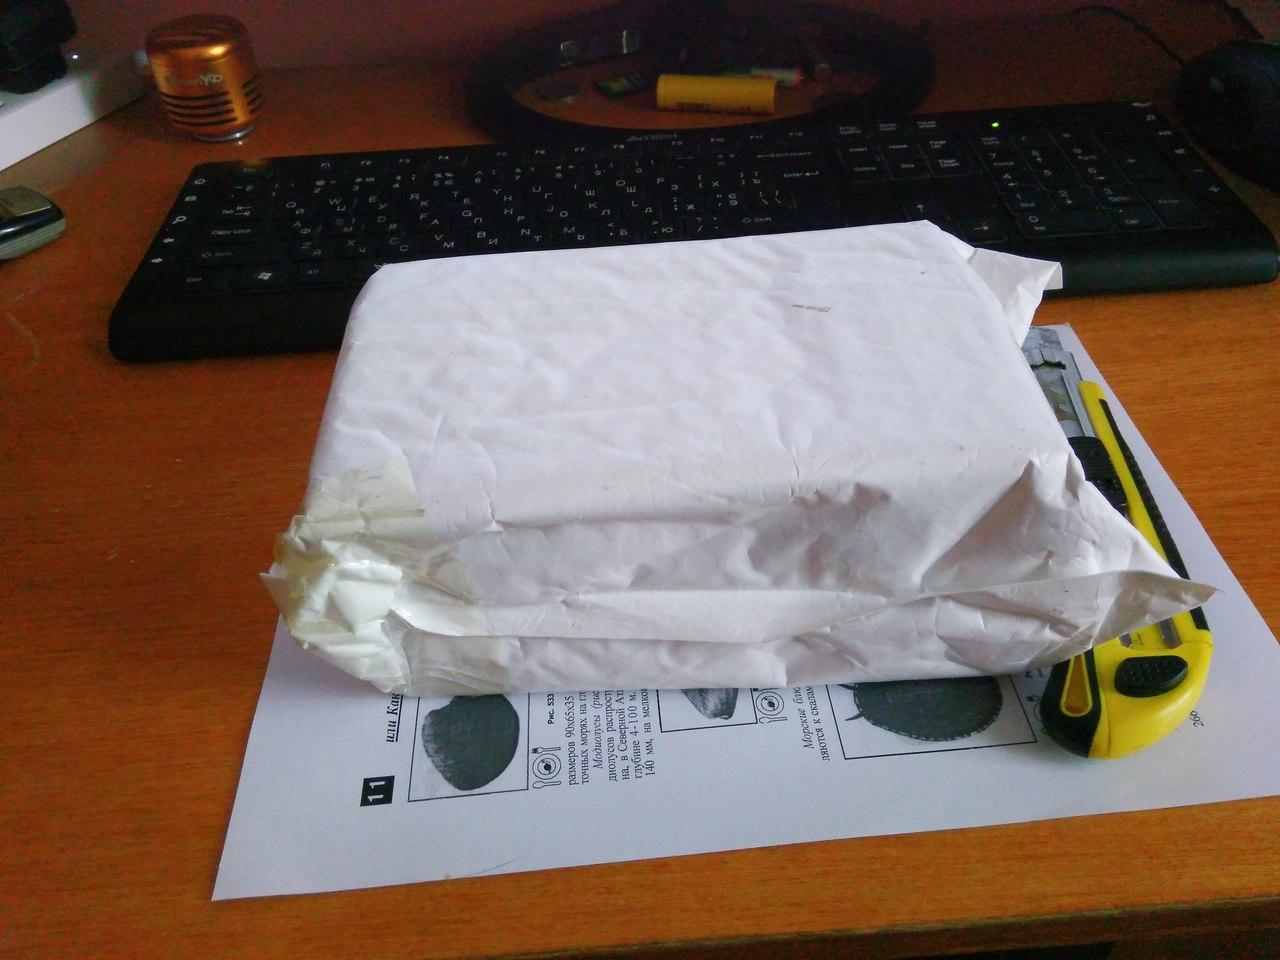 GearBest: Кучка Сяоми товаров - блокнот/фляга/браслет